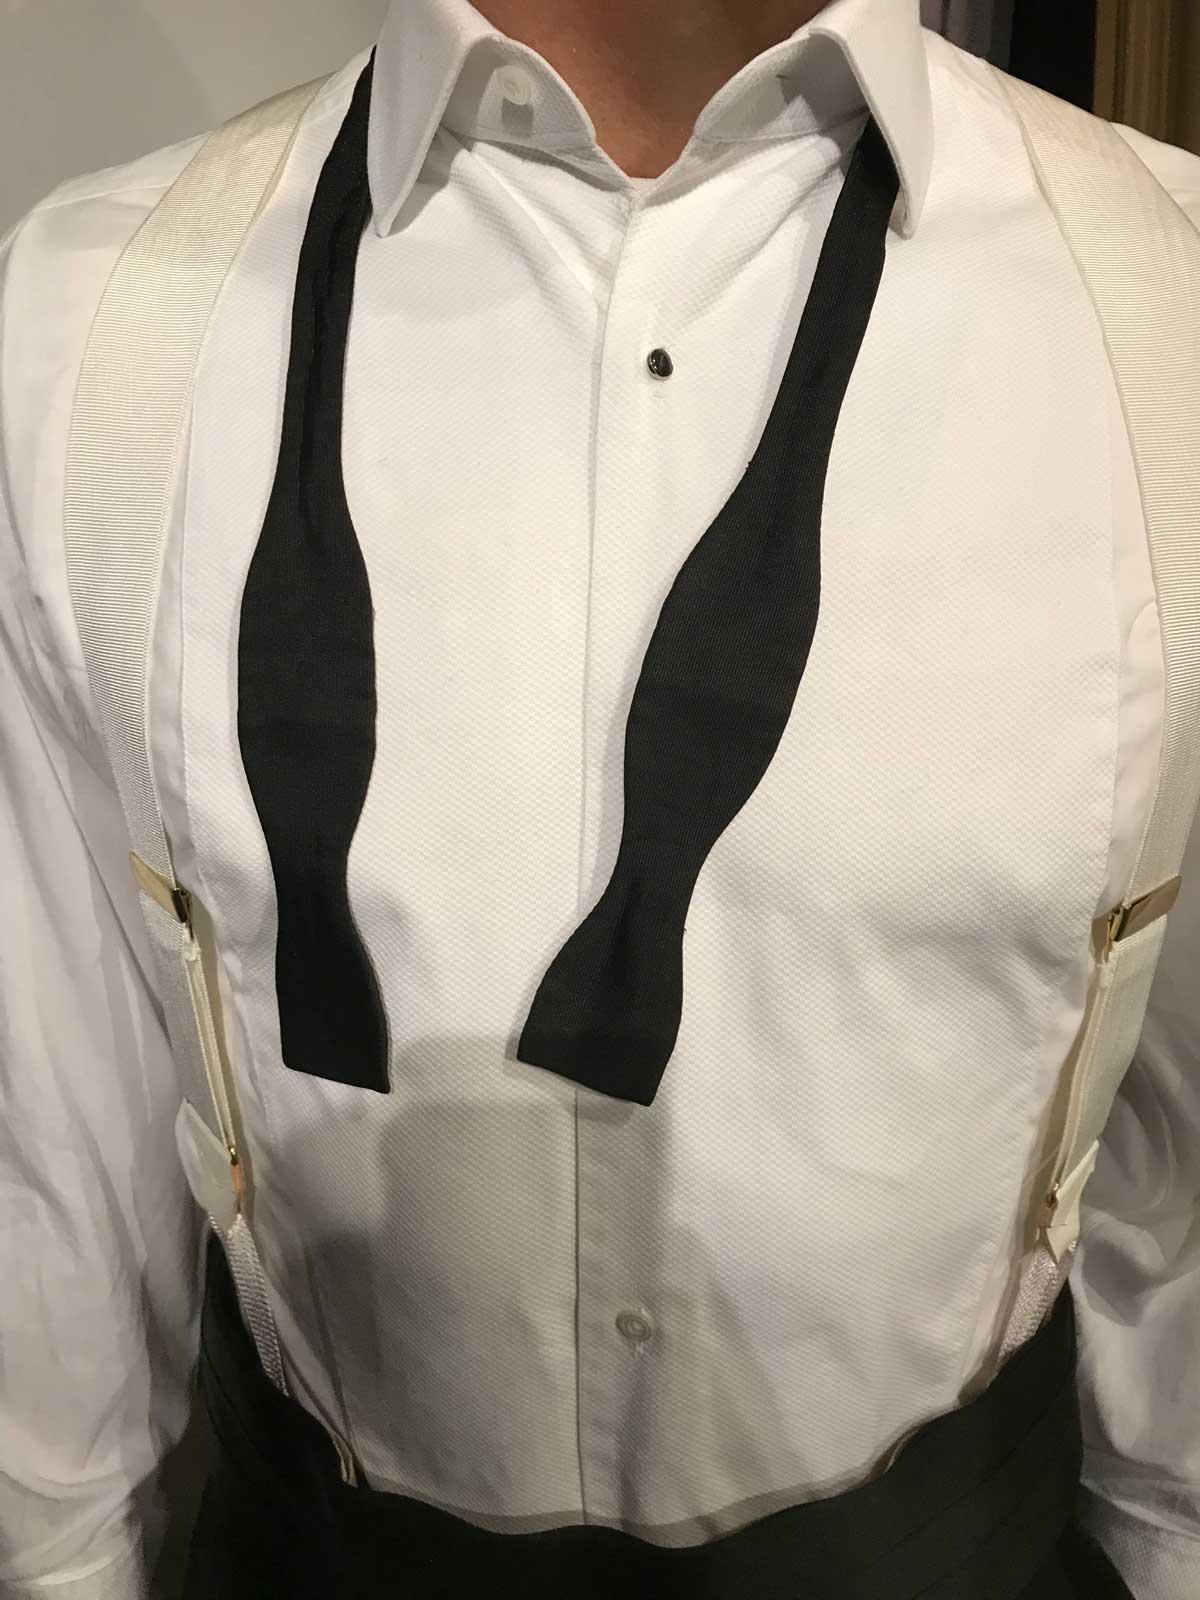 Madame Tussauds daniel craig shirt